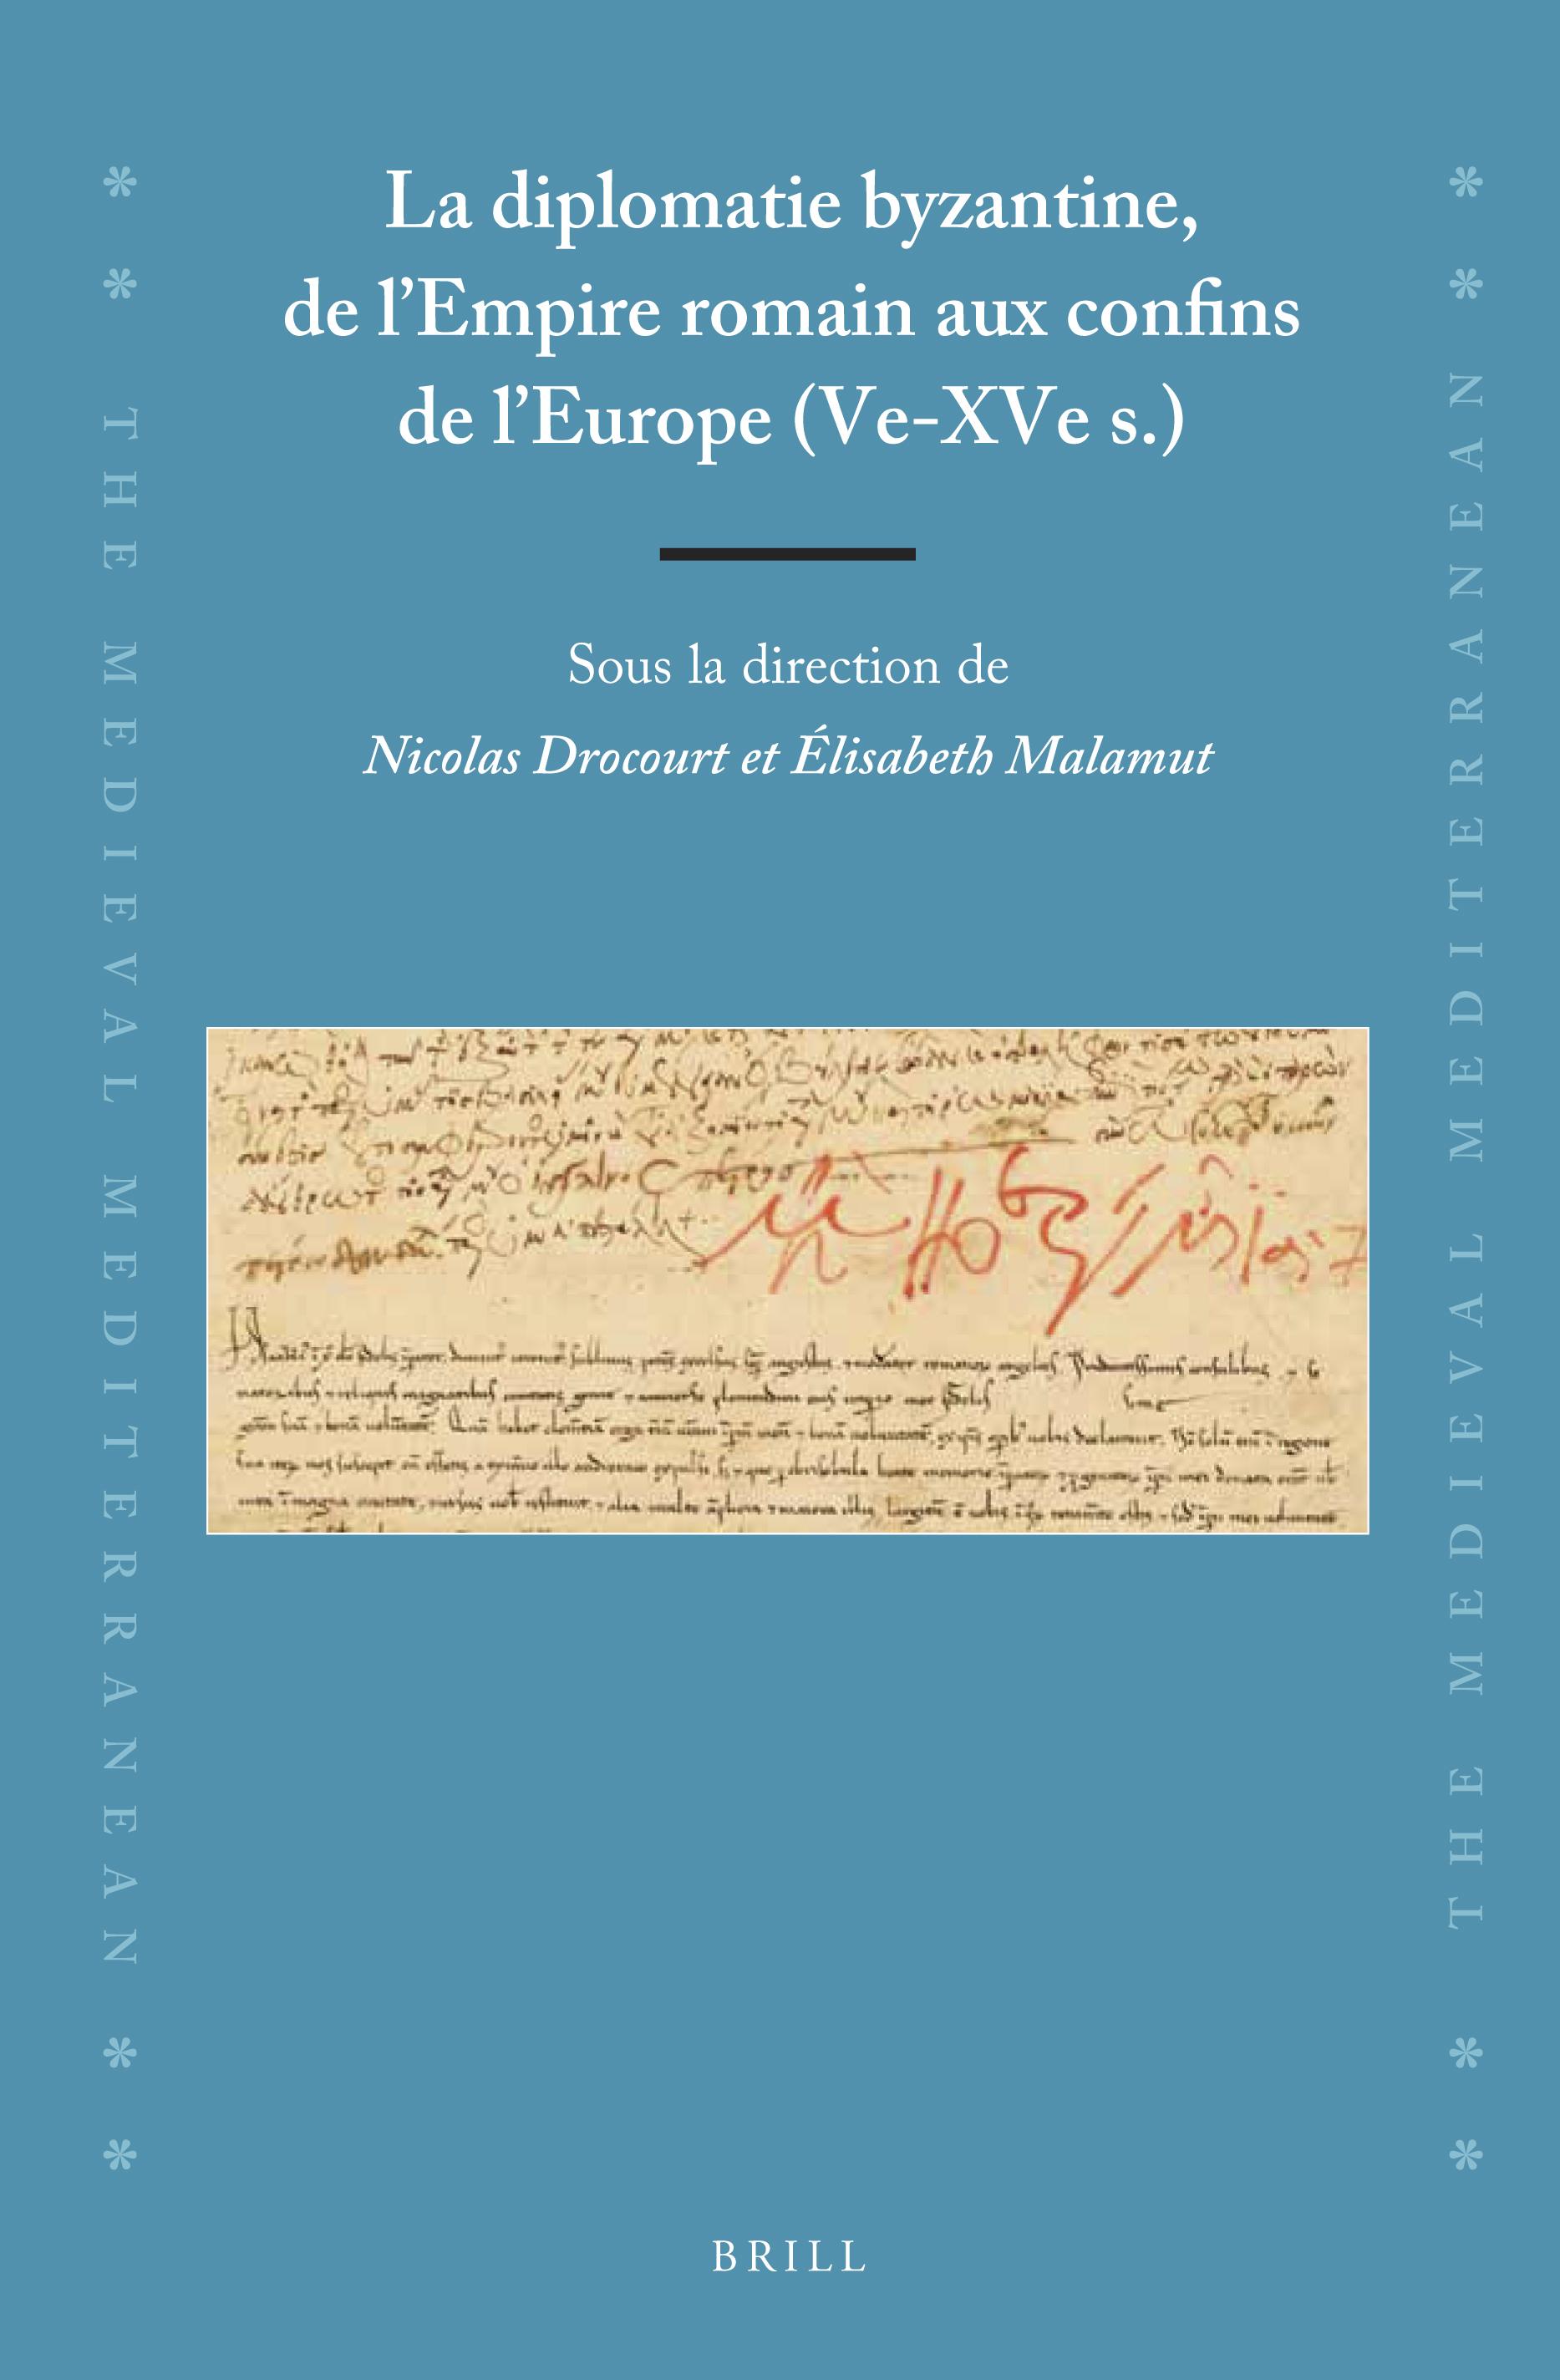 la diplomatie byzantine